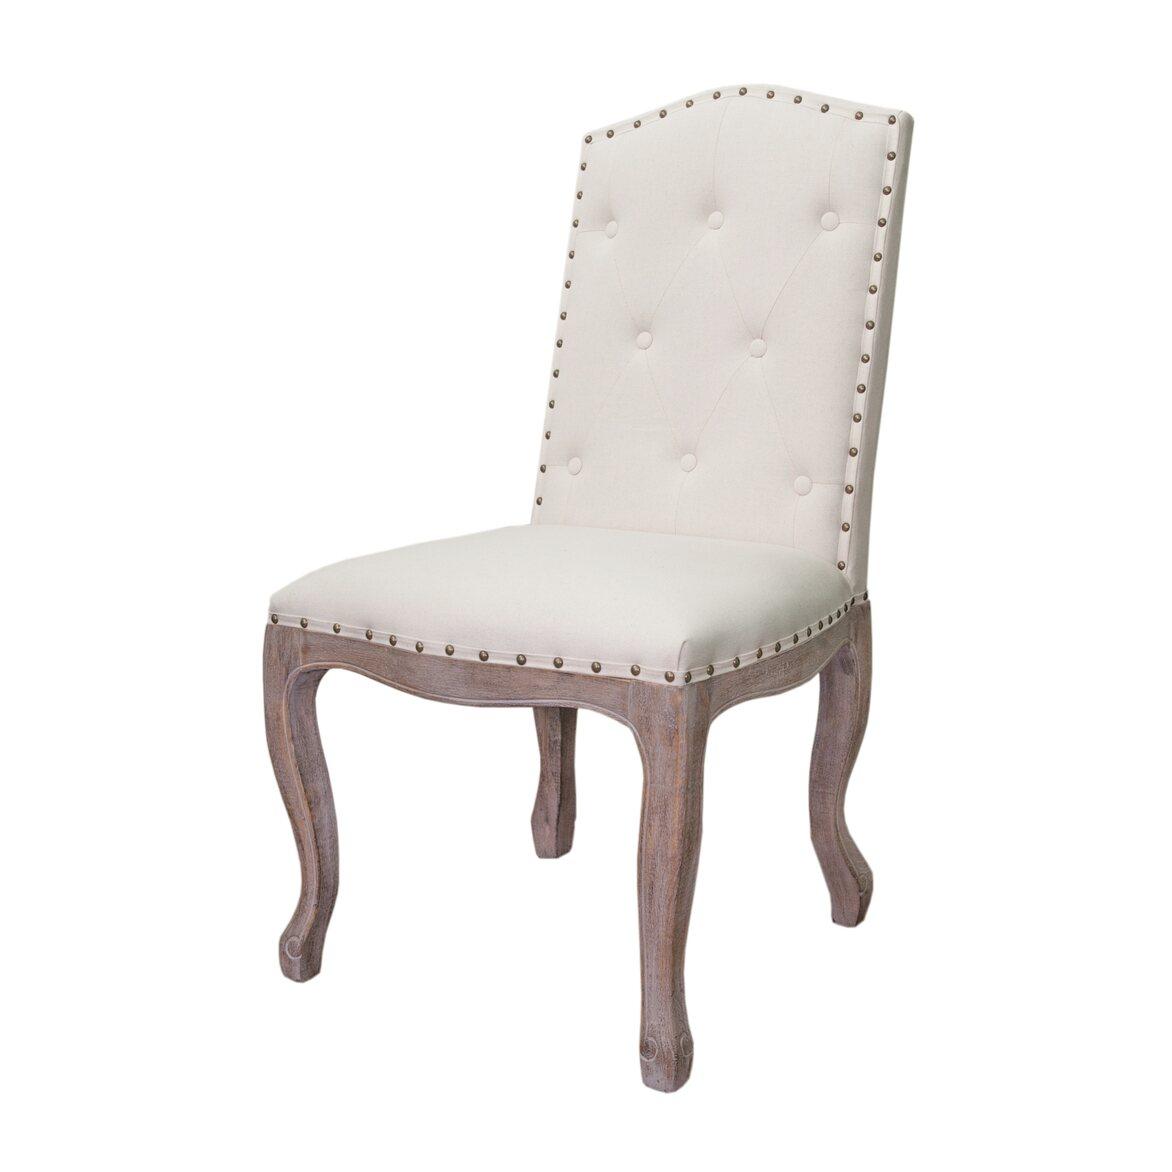 Стул Melis beige 4 | Обеденные стулья Kingsby